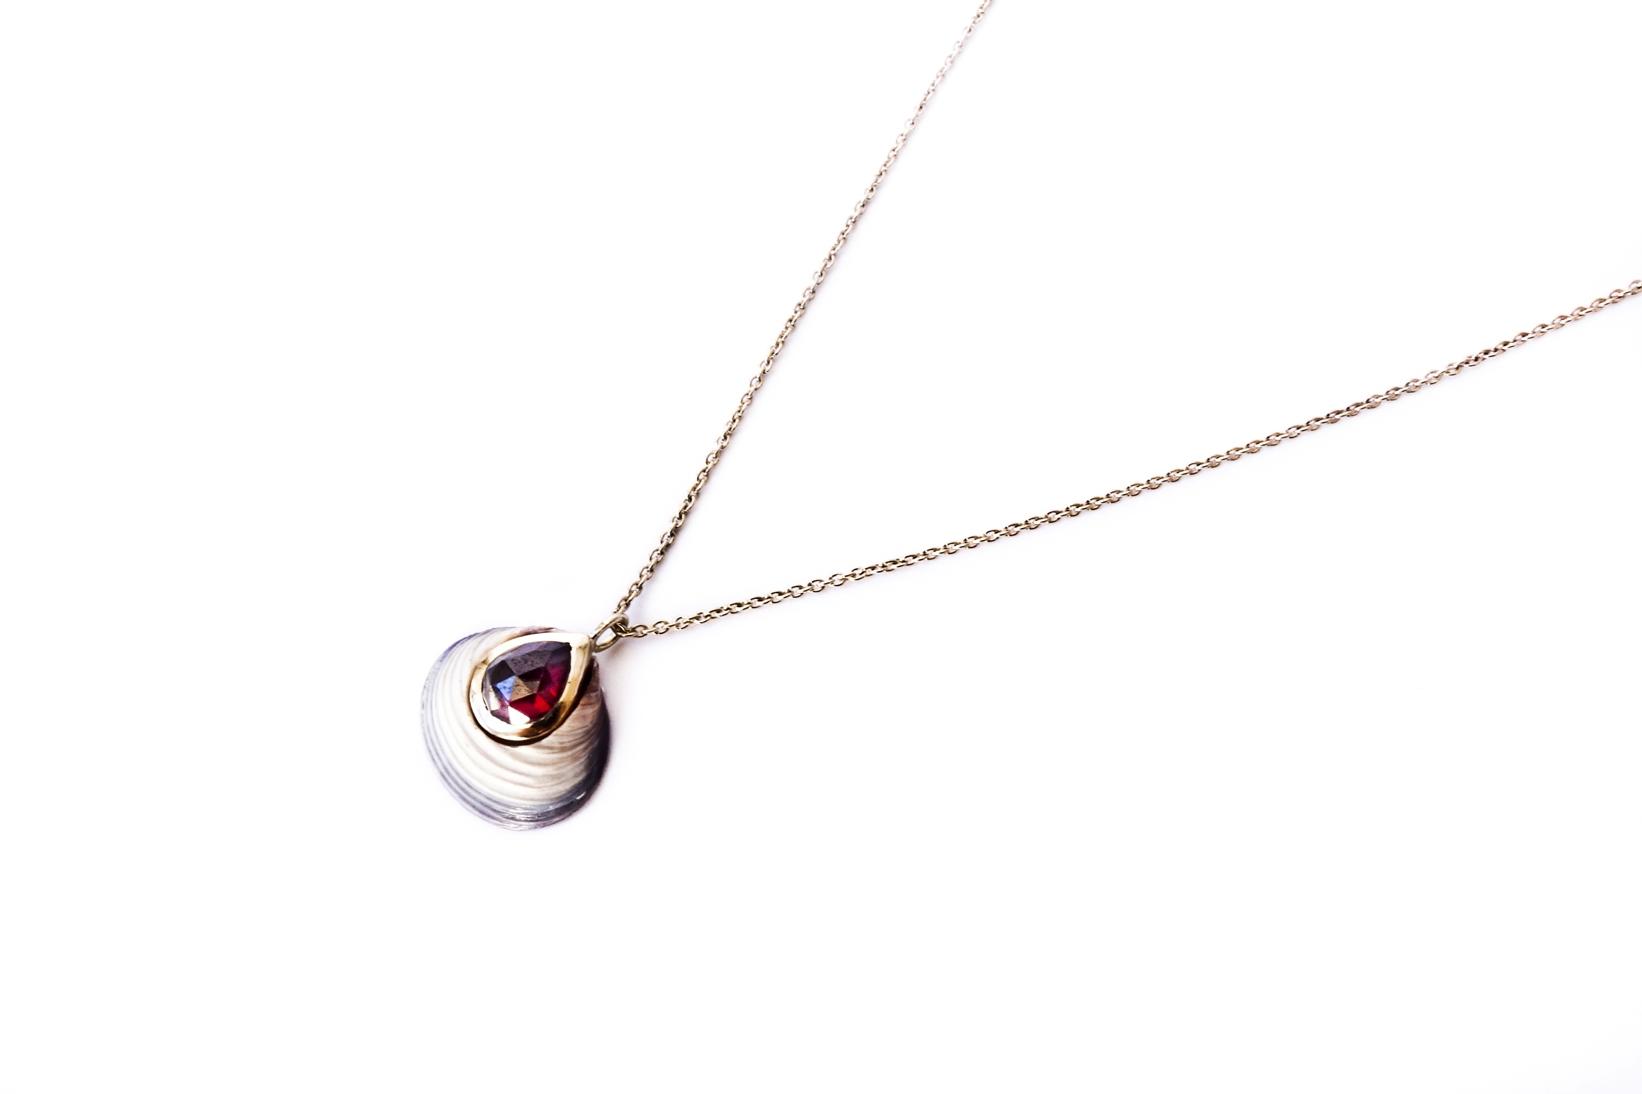 Blue Venus necklace - Garnet